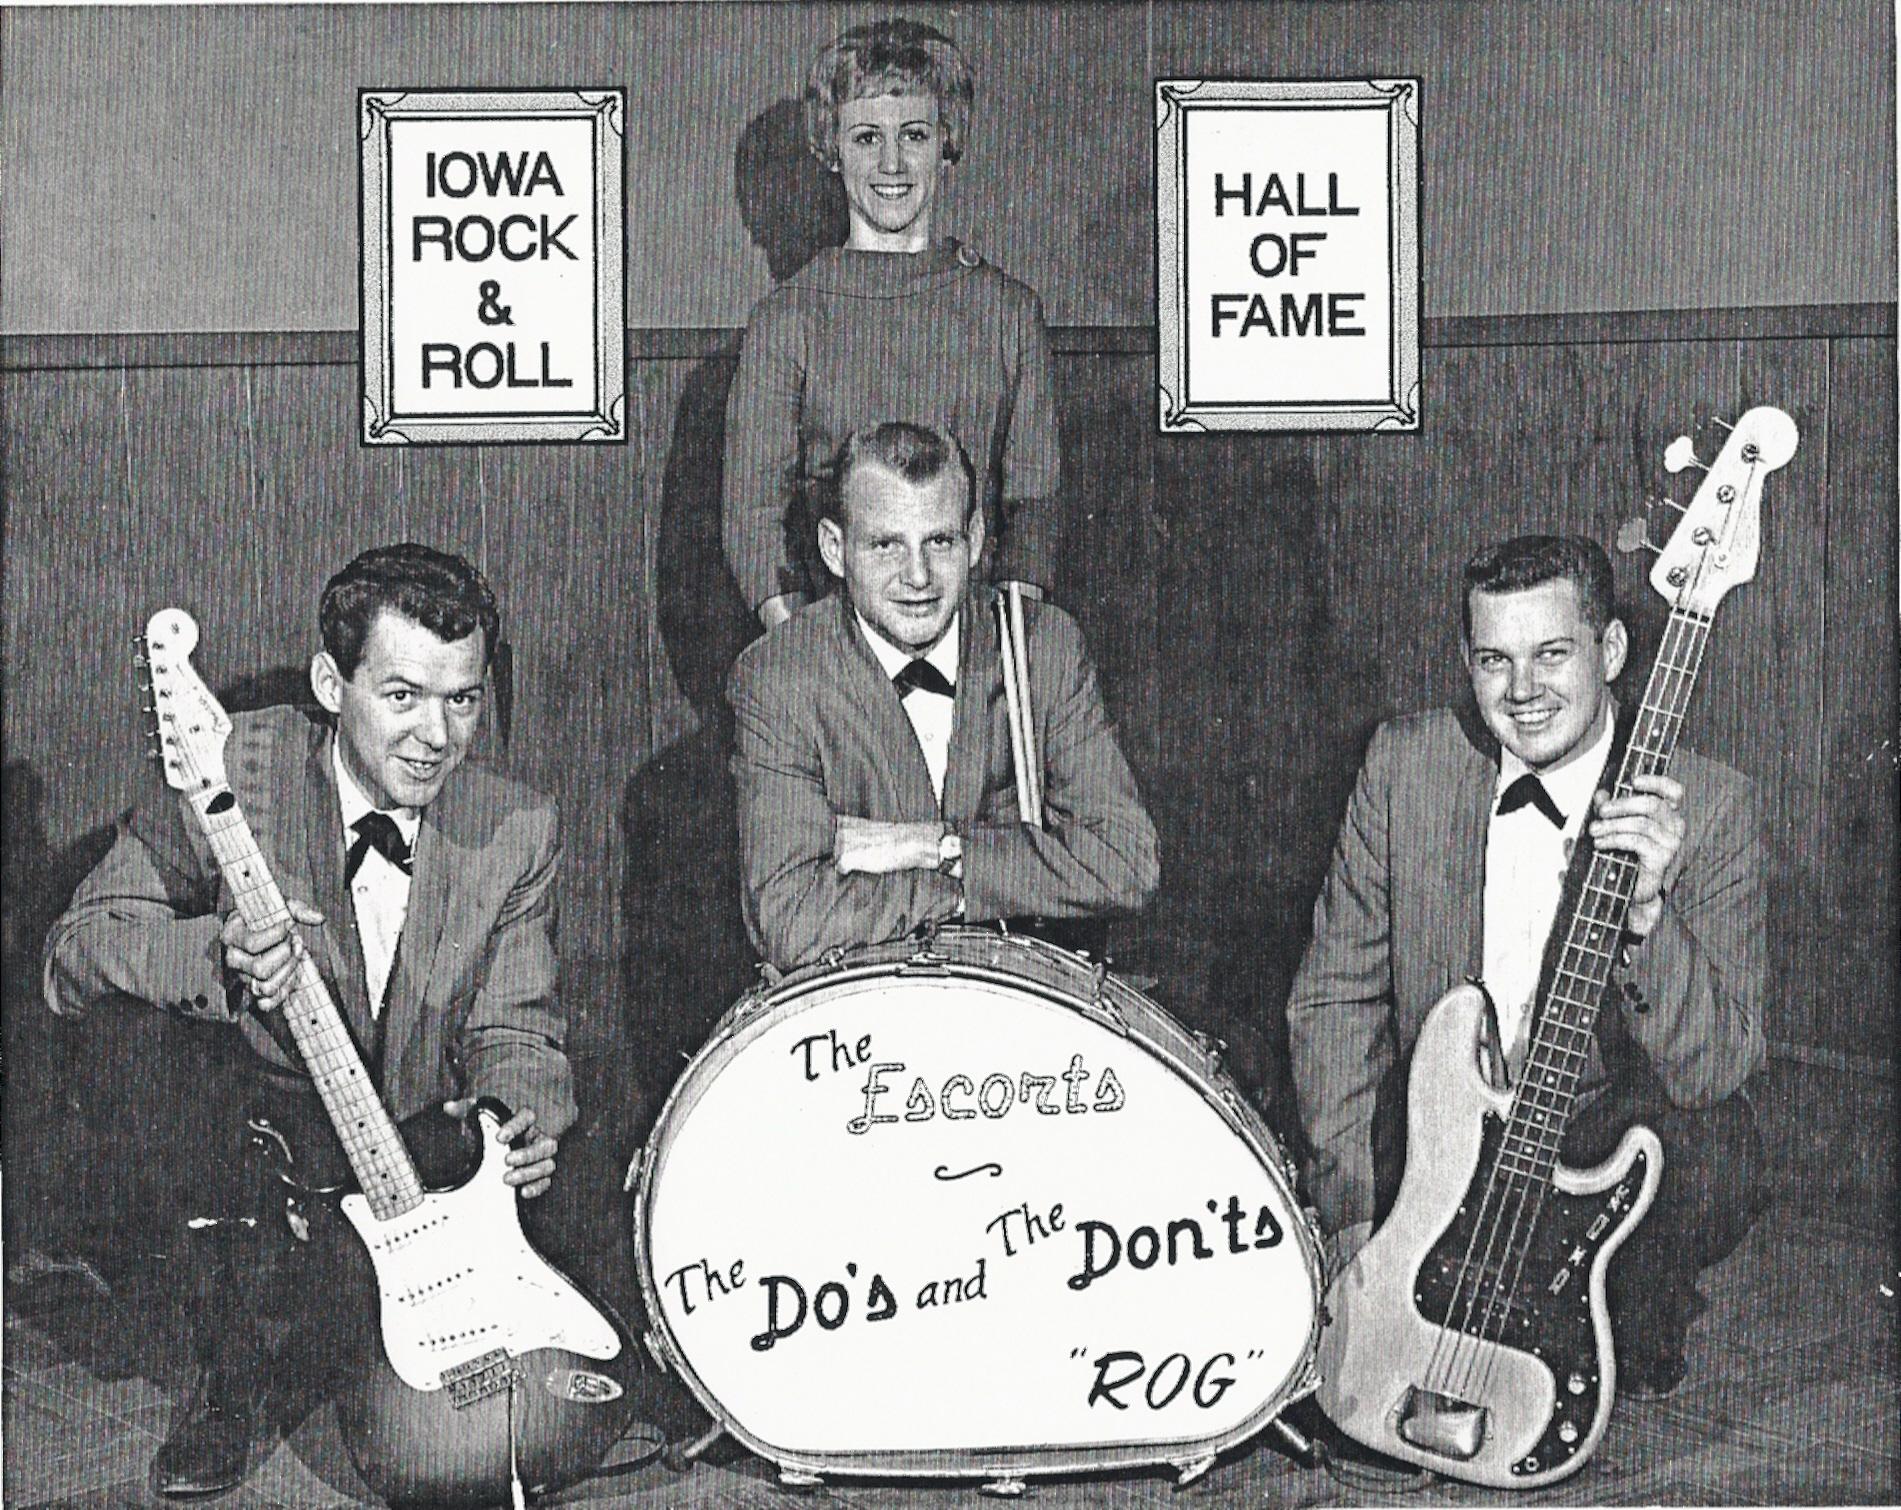 Cedar Rapids Escorts >> The Escorts Rock Band 1950s and 60s Music - Cedar Rapids, Iowa